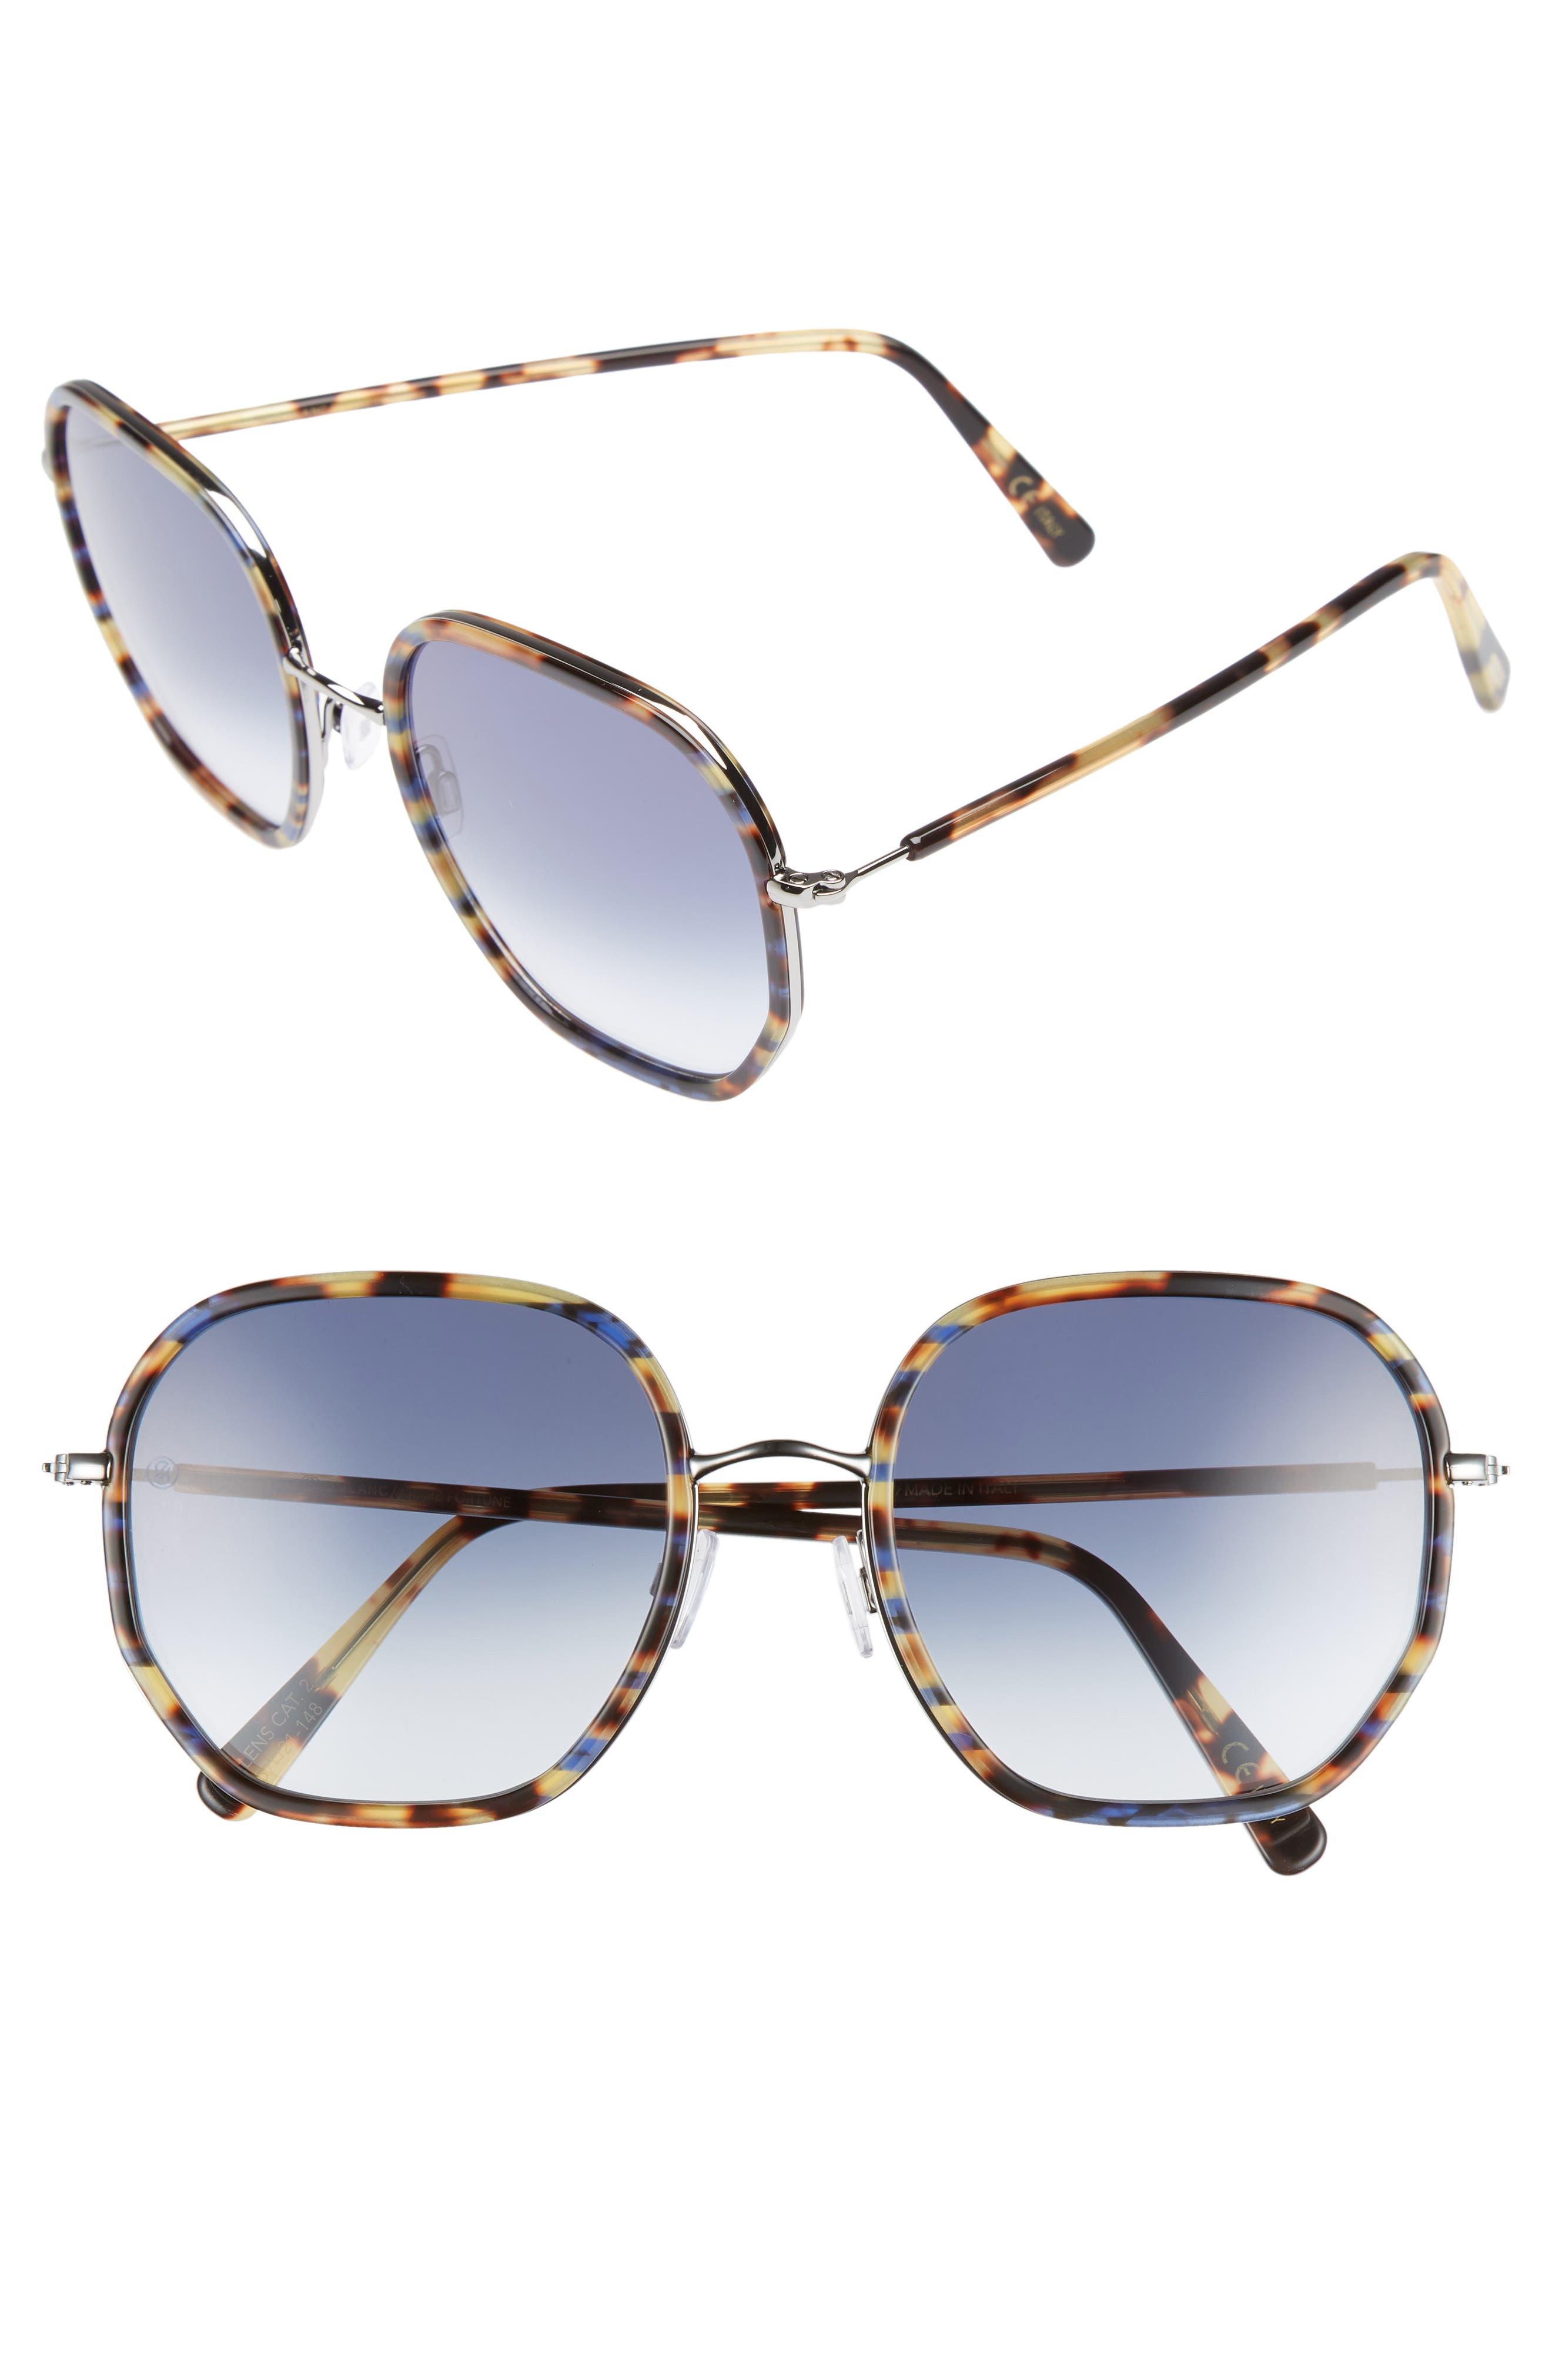 D'BLANC Rare Fortune 59mm Sunglasses,                         Main,                         color, INDIGO TORTOISE